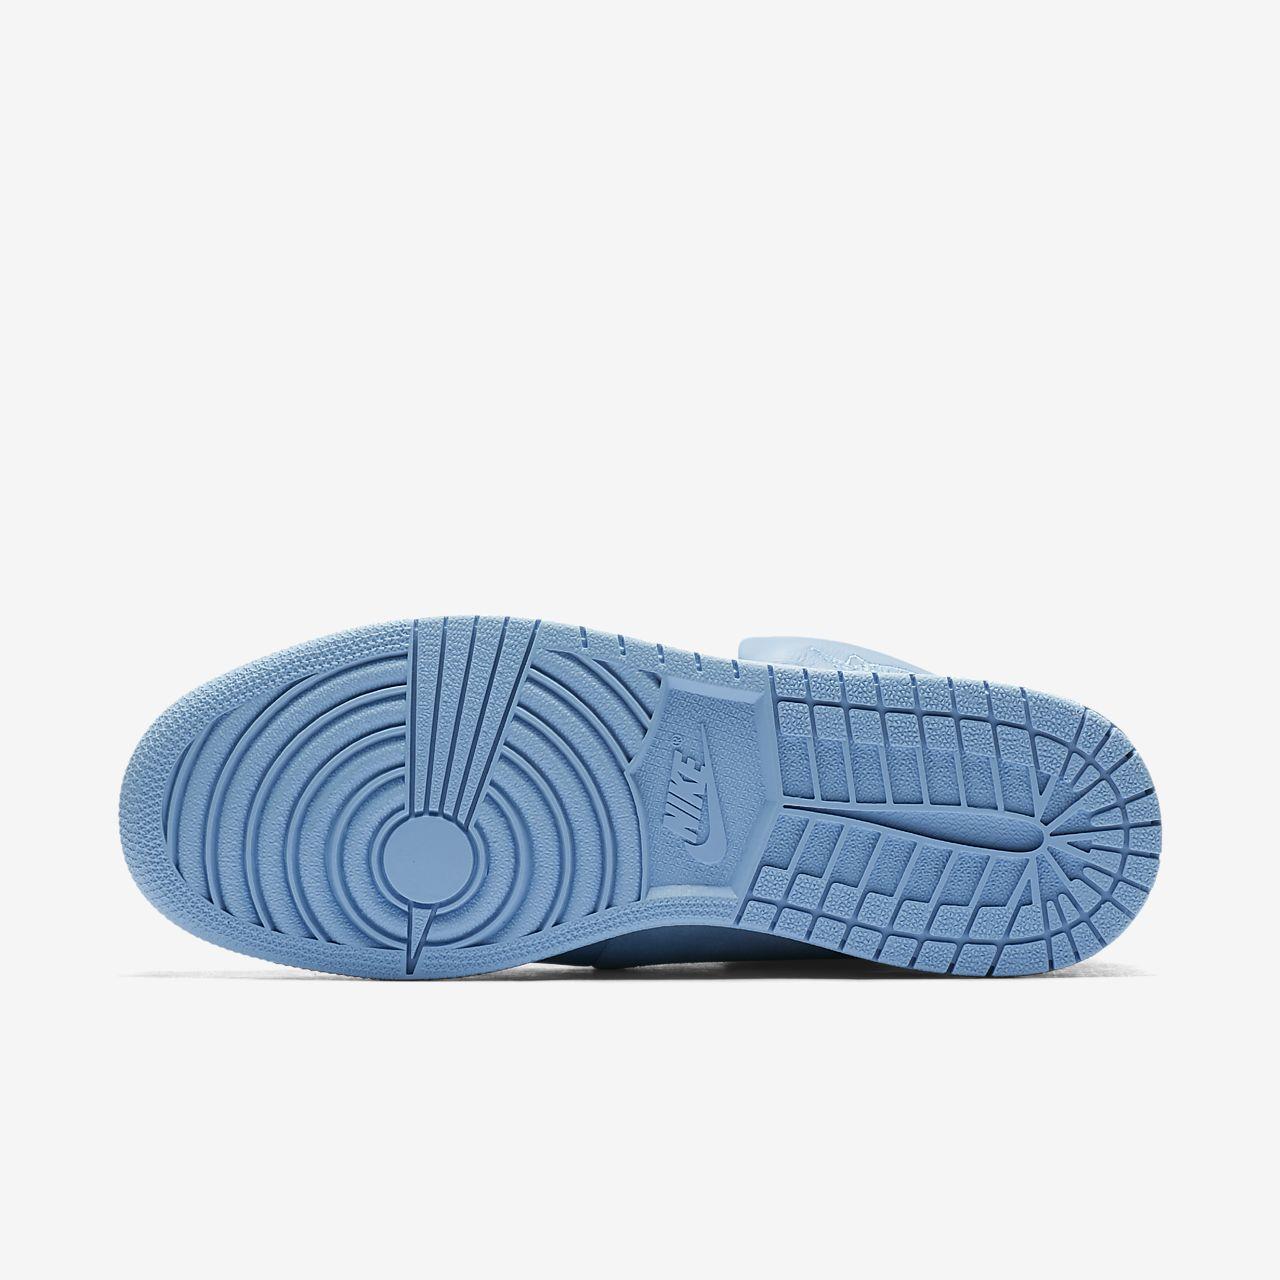 new style 46138 9ca03 Jordan AJ1 Sage XX damesko. Nike.com NO